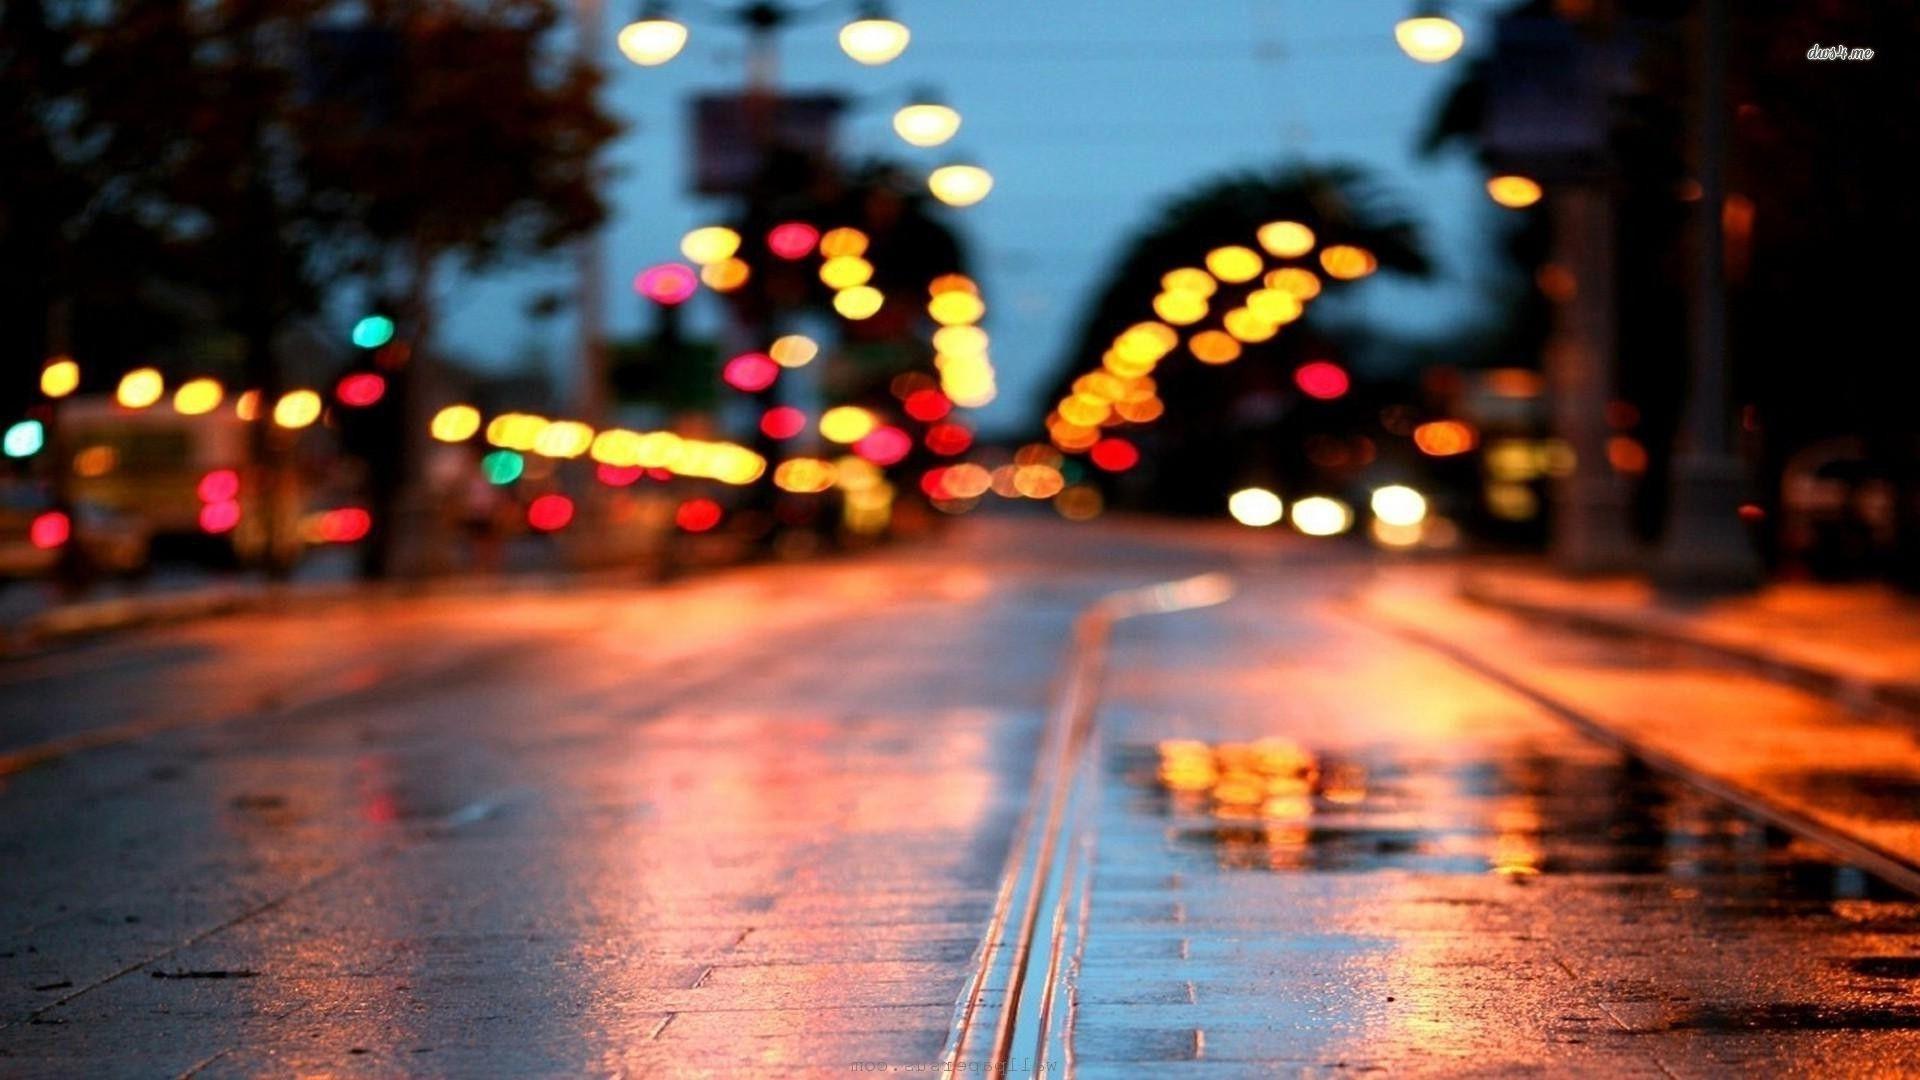 pin city nightlife wallpaper - photo #32